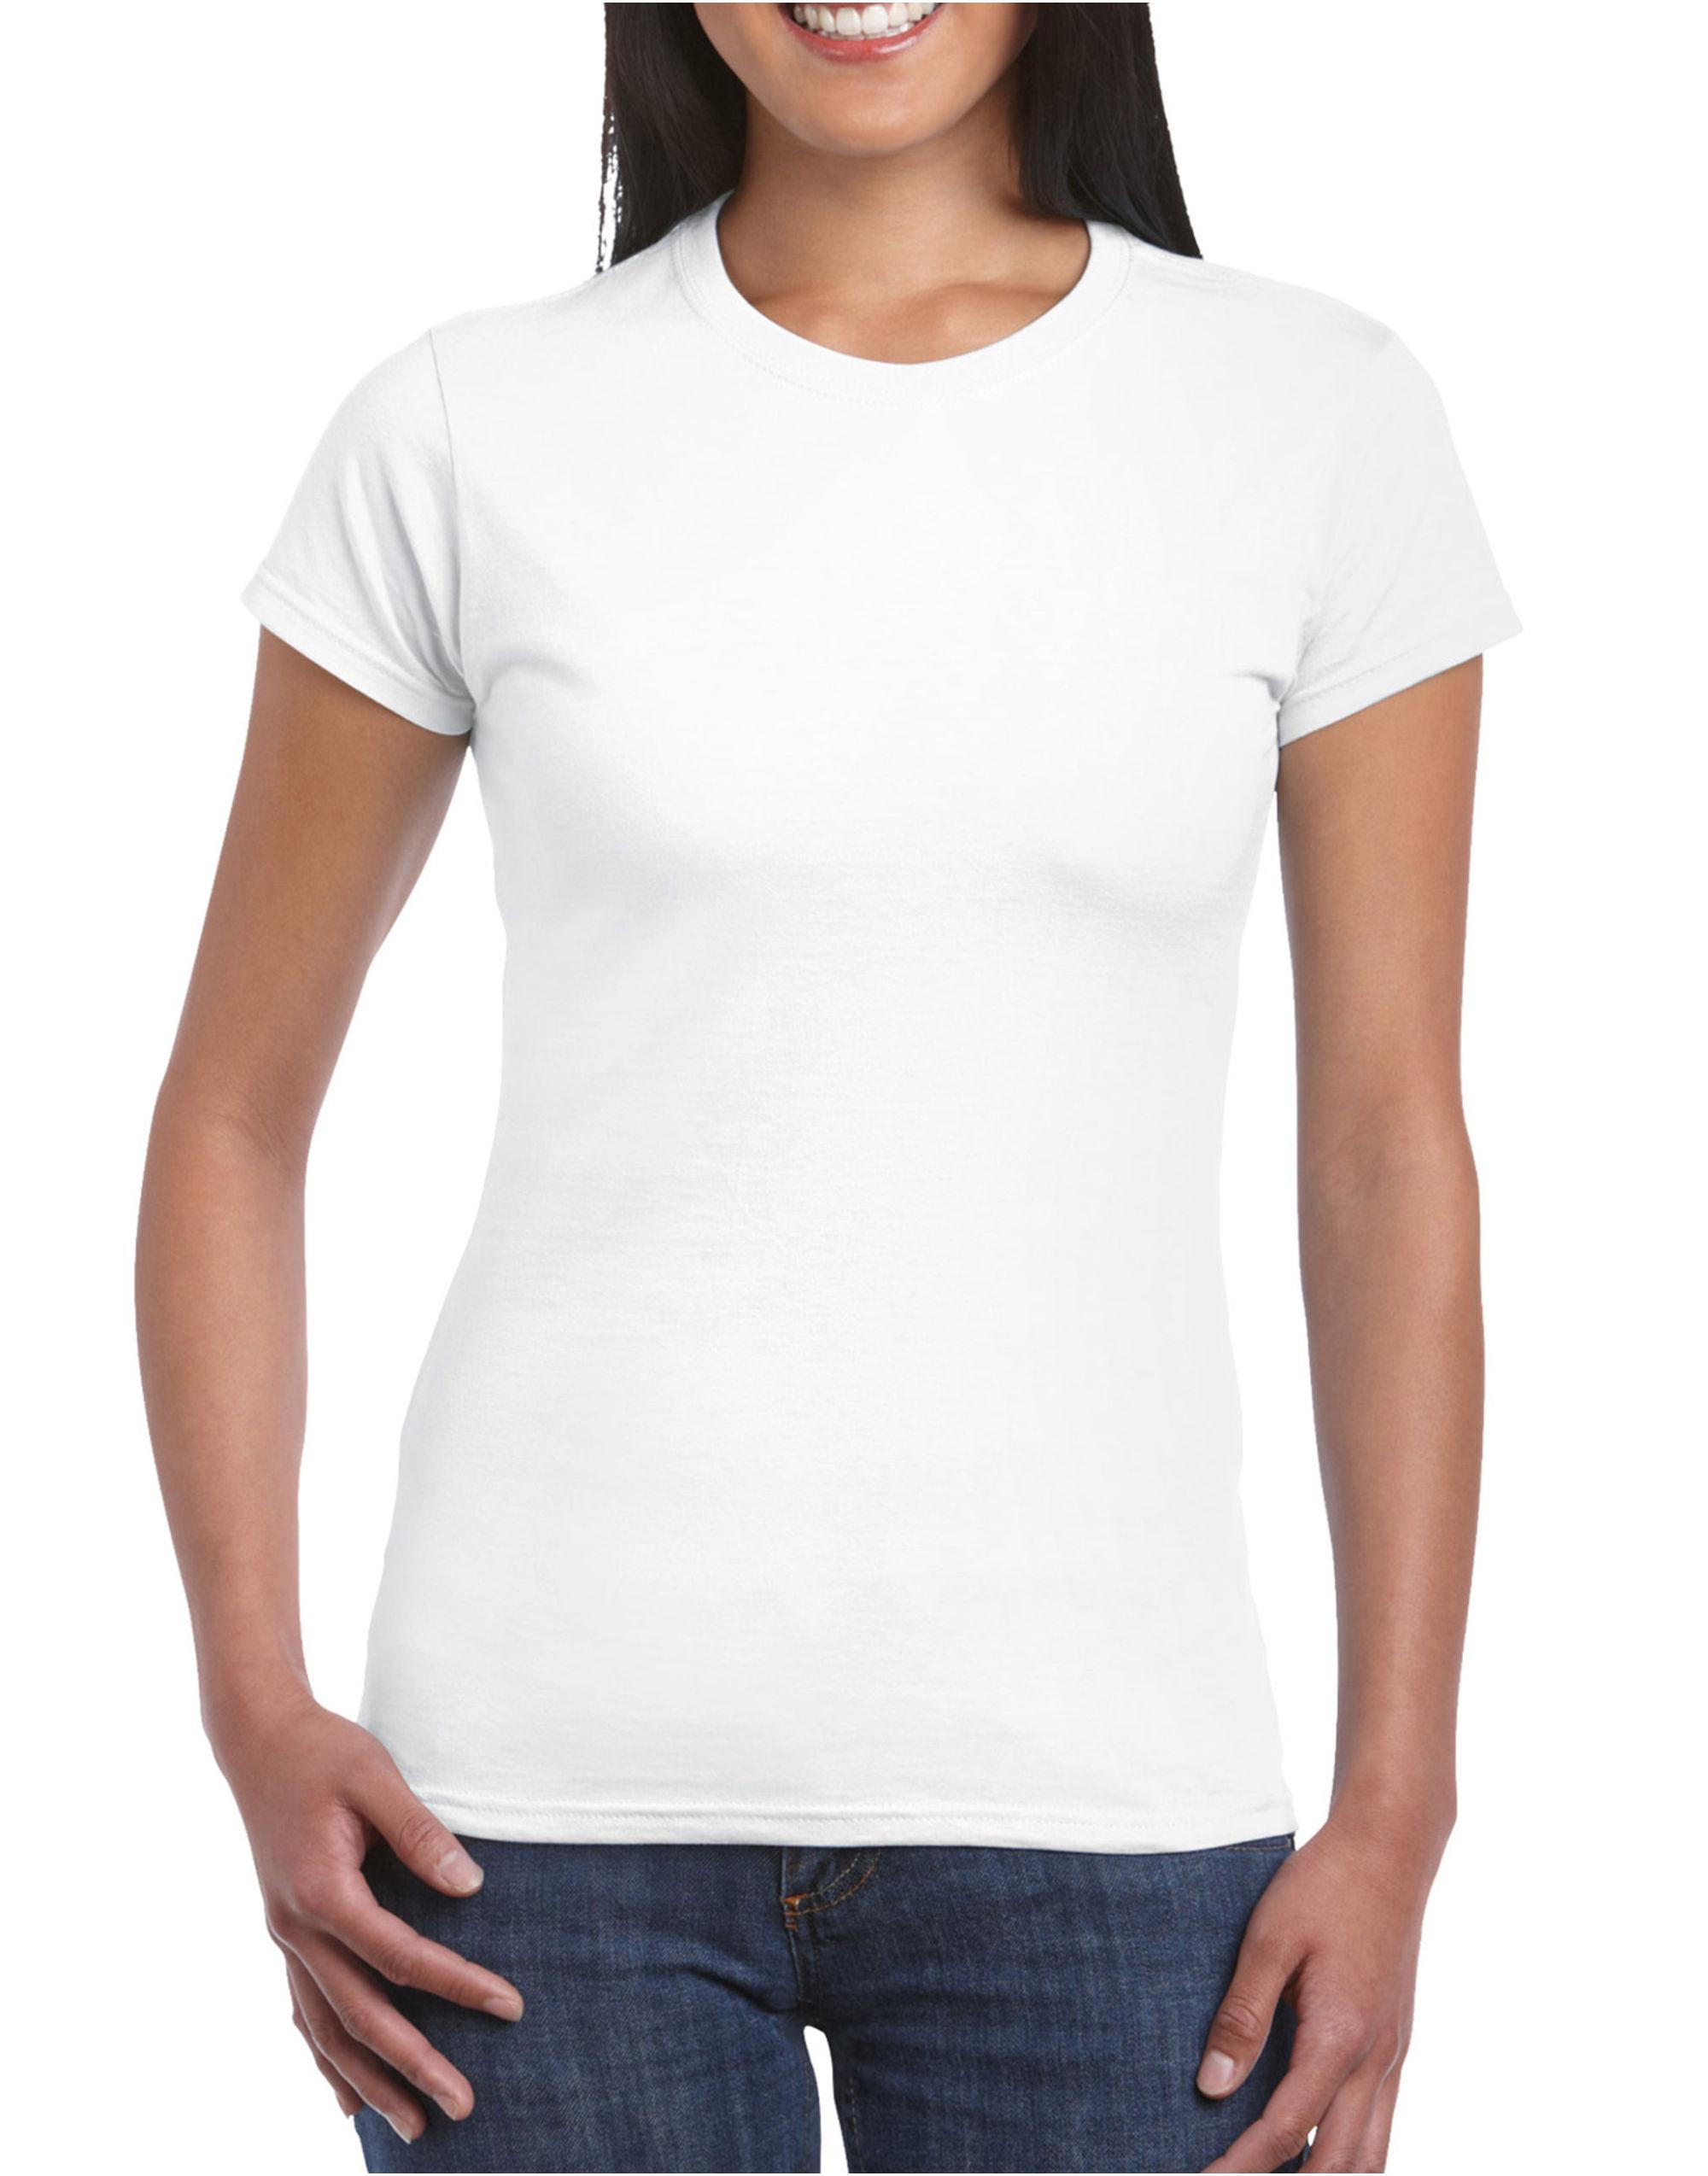 Ladies' Soft Style T-Shirt